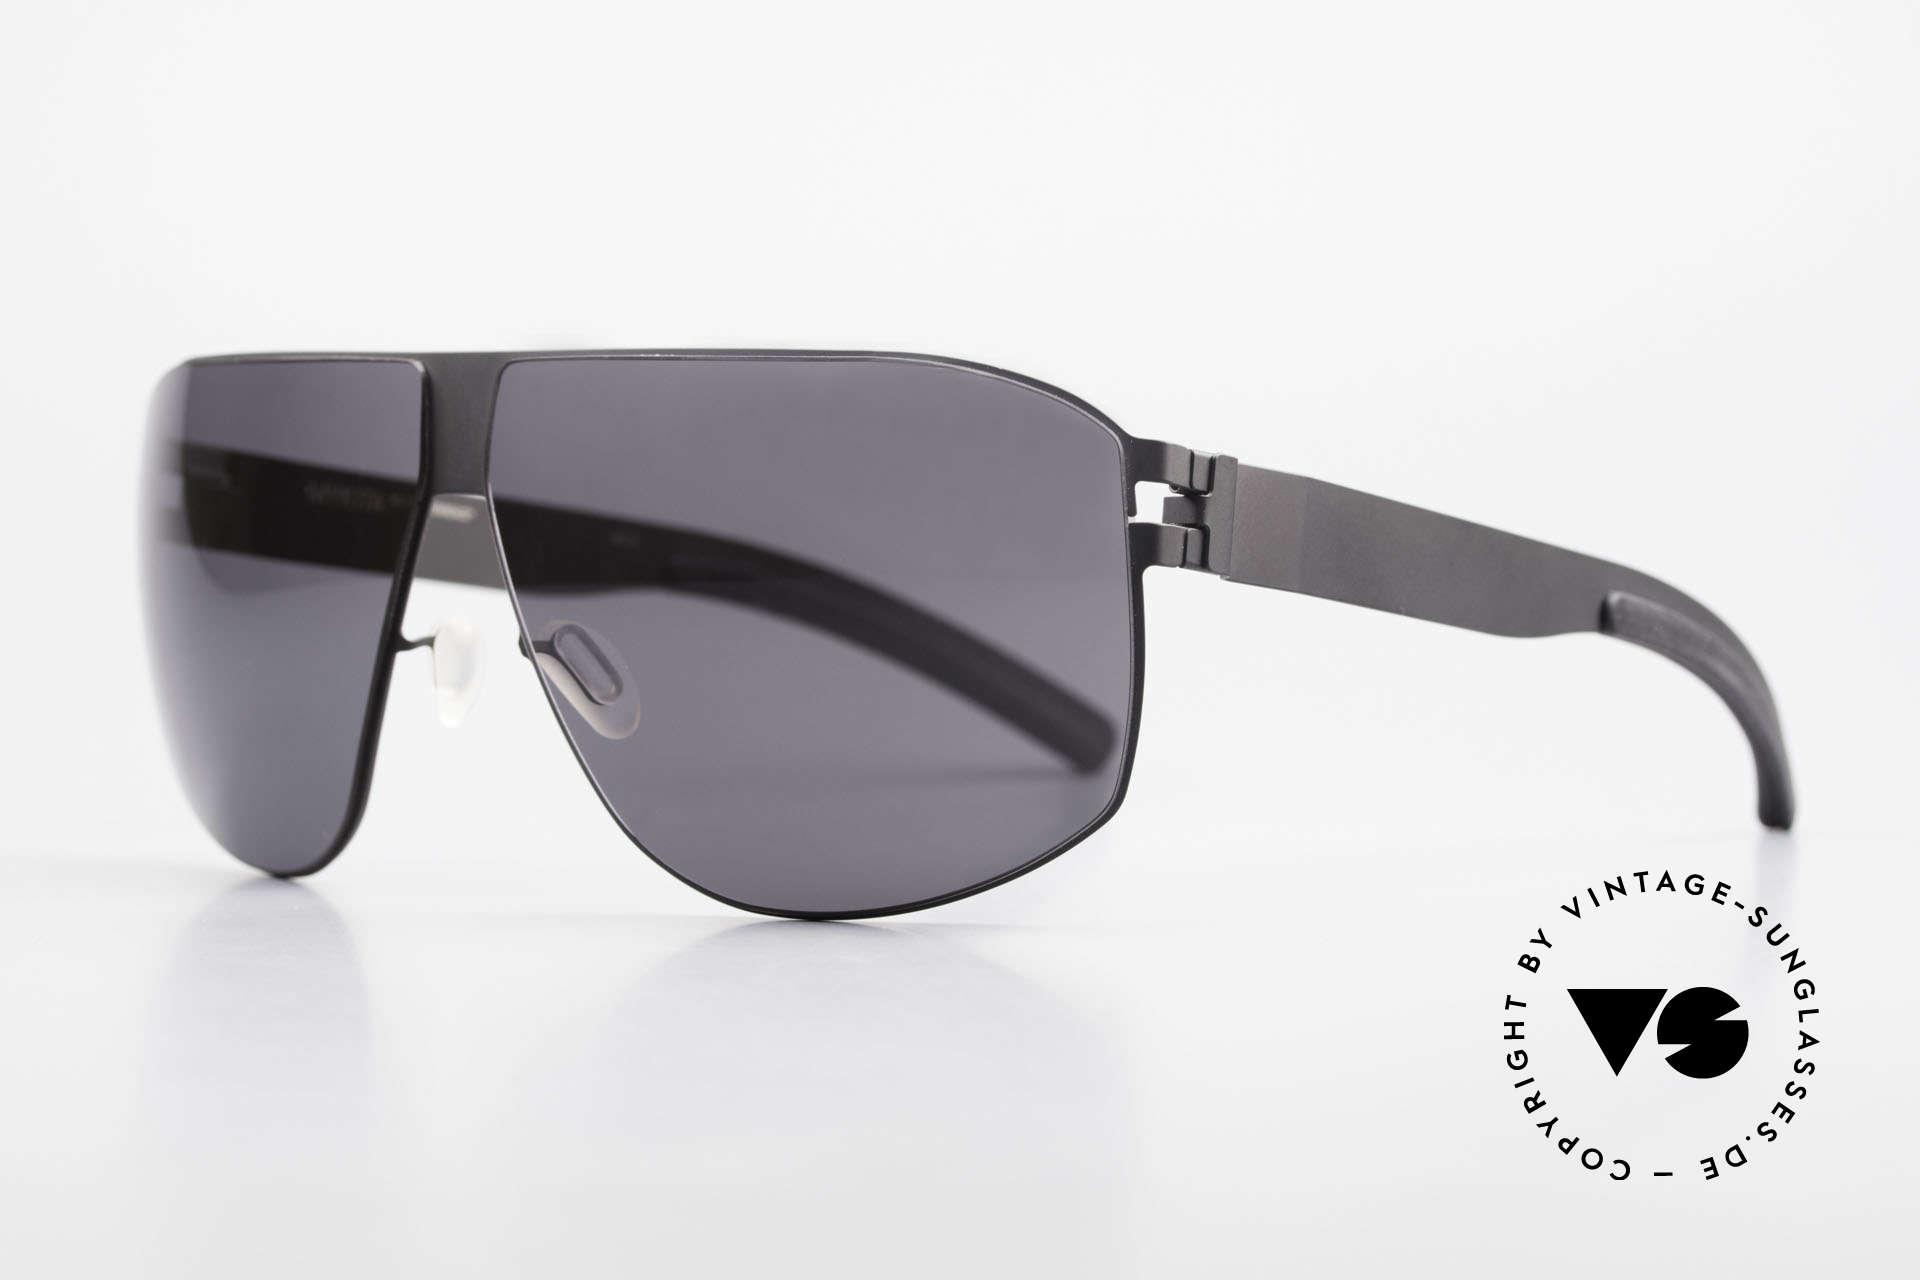 Mykita Terrence Vintage Mykita Sunglasses 2011, Model No.1 Sun Terrence Black, black-solid, size 66/08, Made for Men